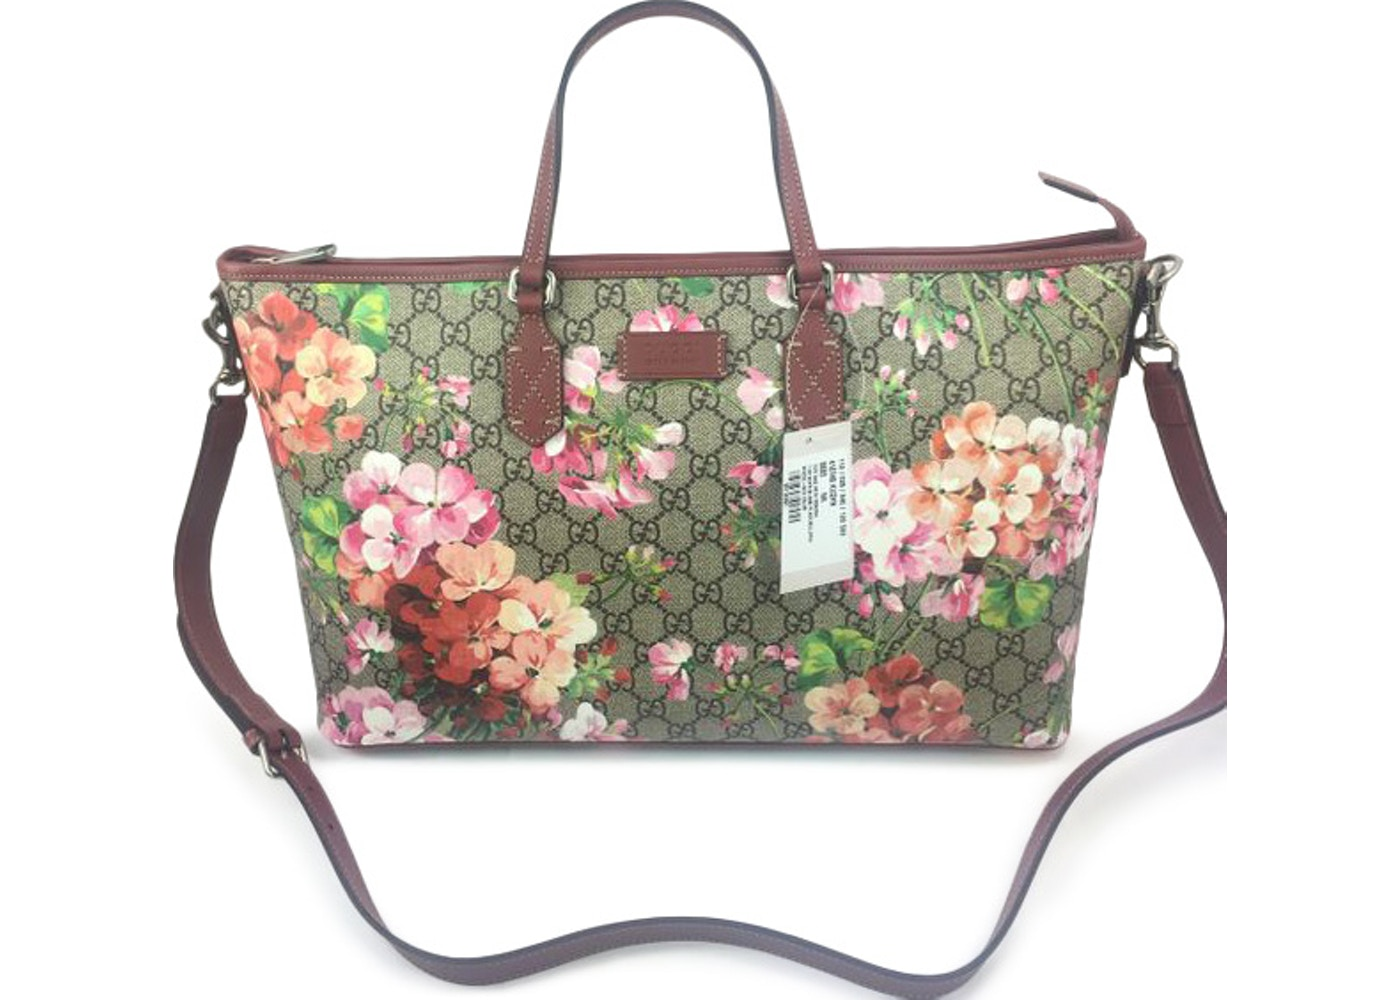 a70a3b4e1bd Gucci Bloom Floral Tote Supreme GG (With Strap) Pink/Brown Multicolor